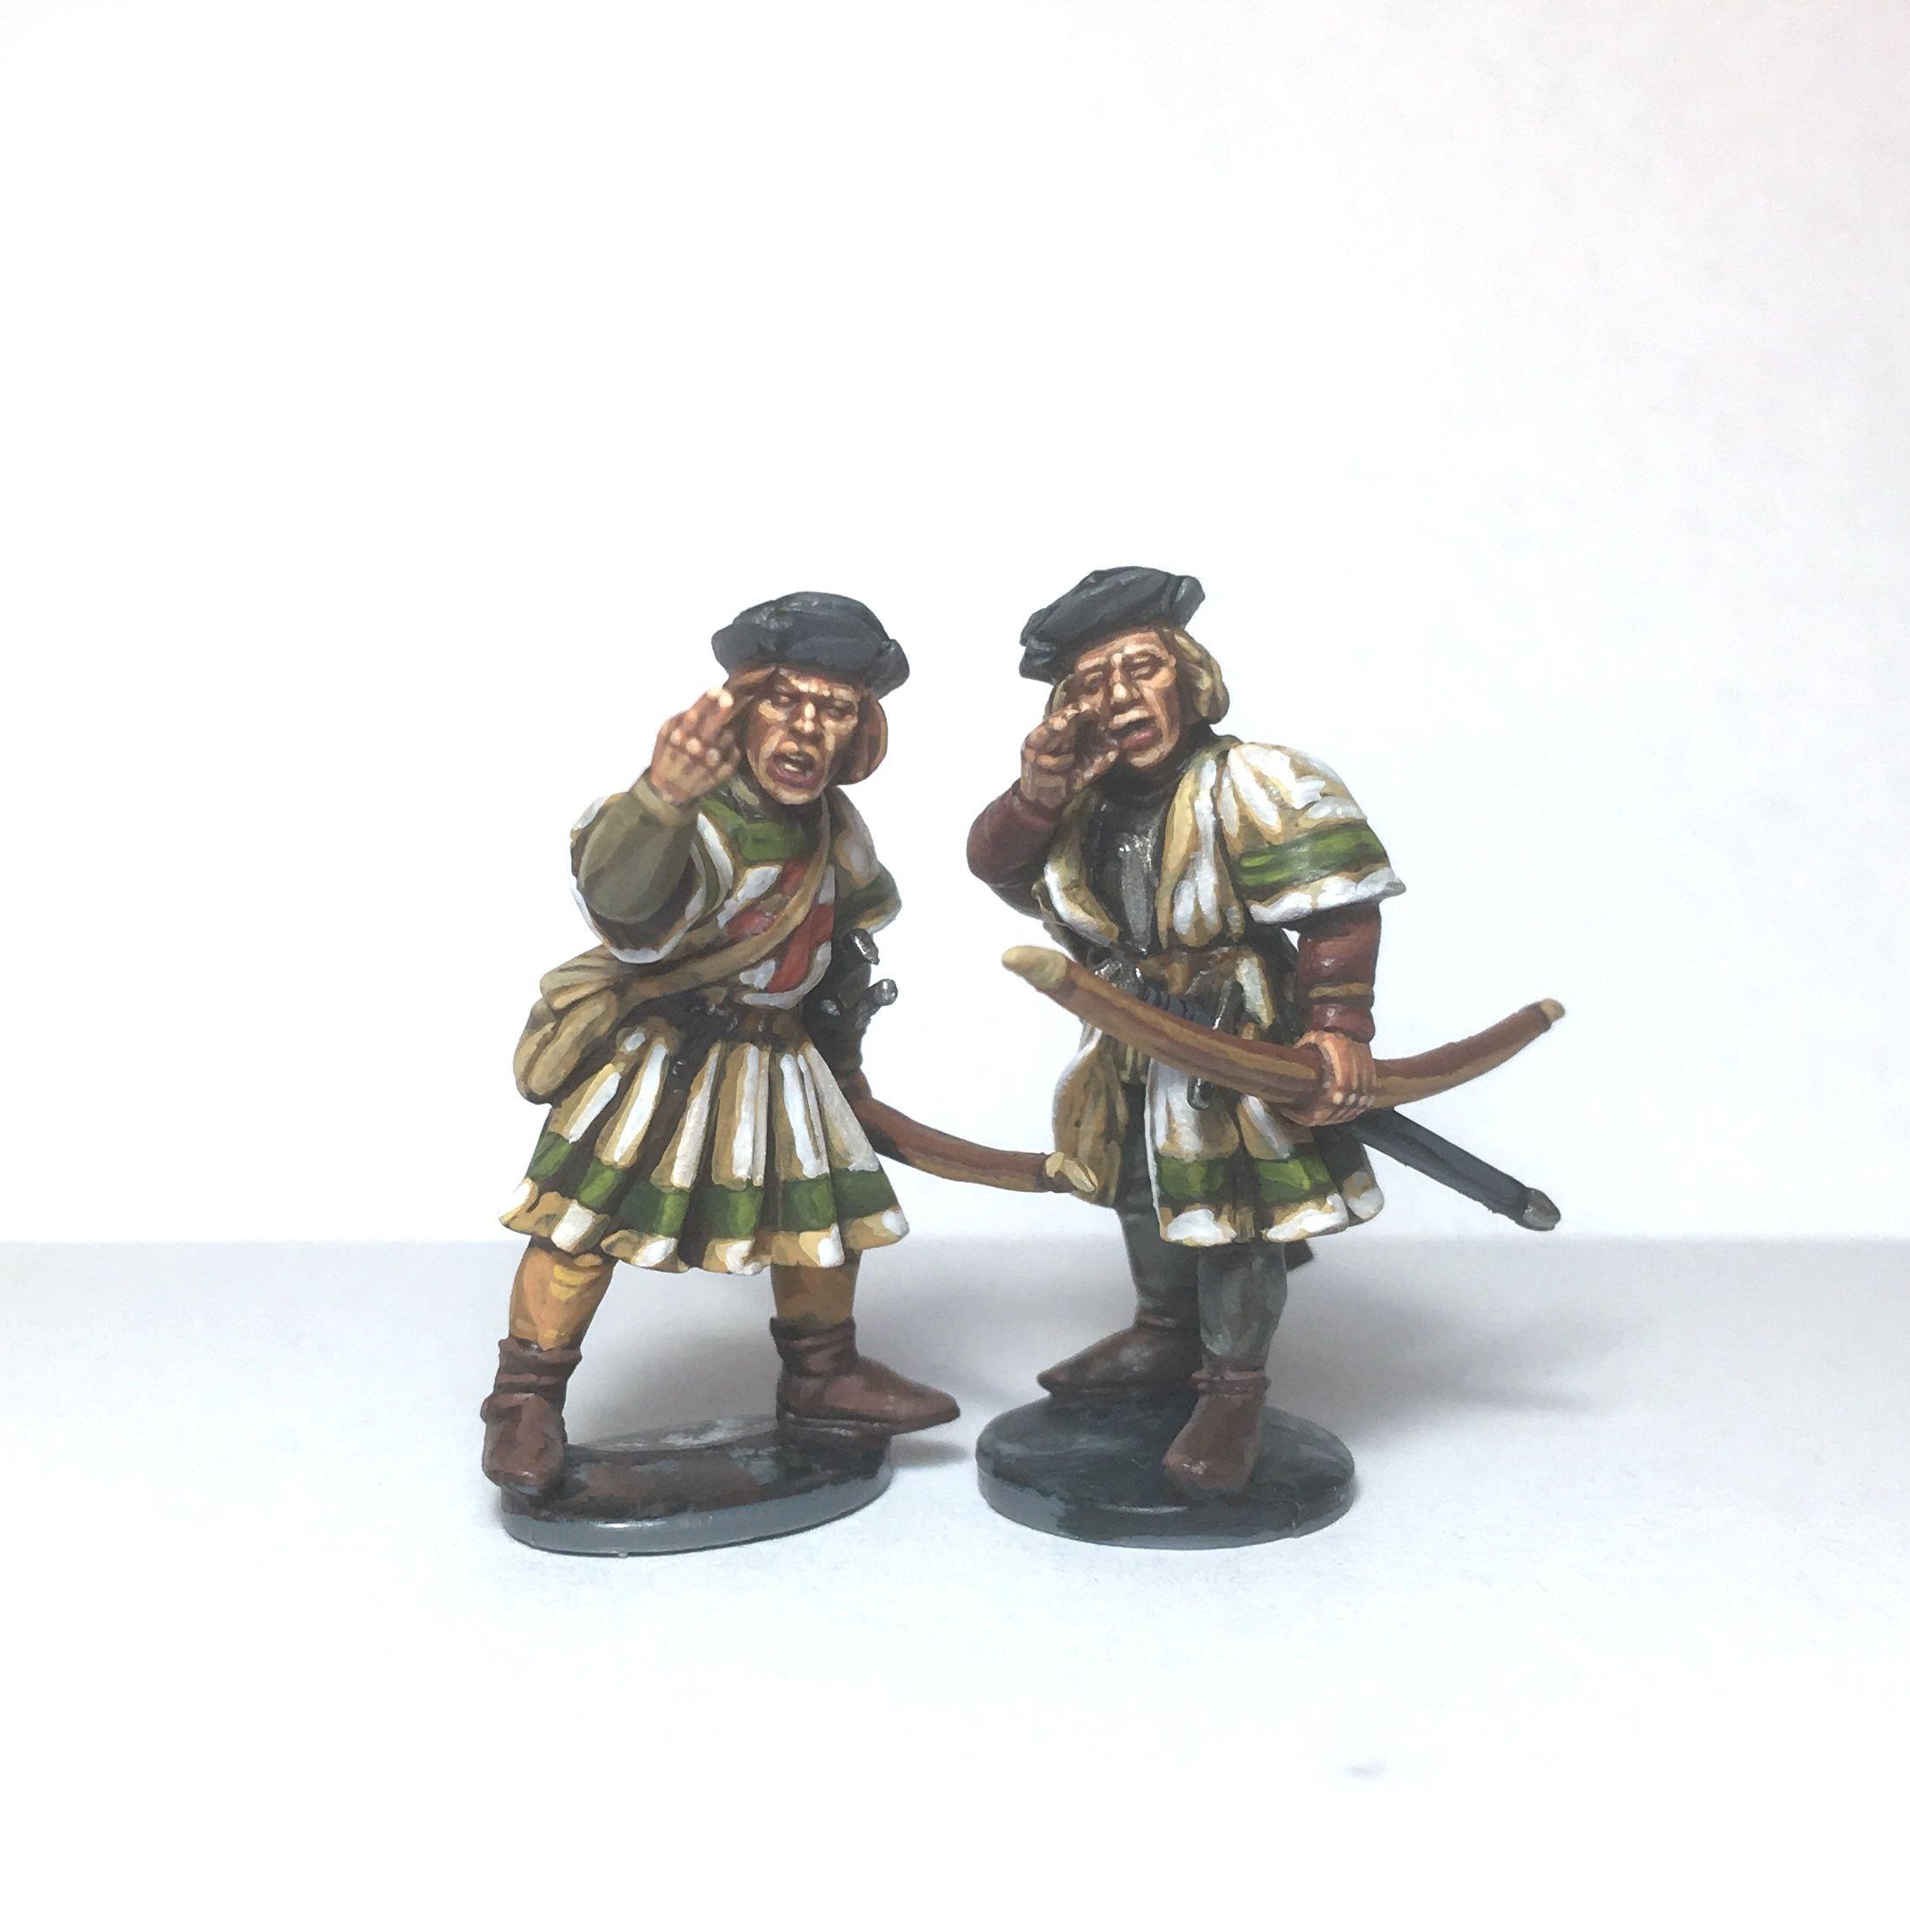 Pin by carsten dengler on wargameing models Miniatures